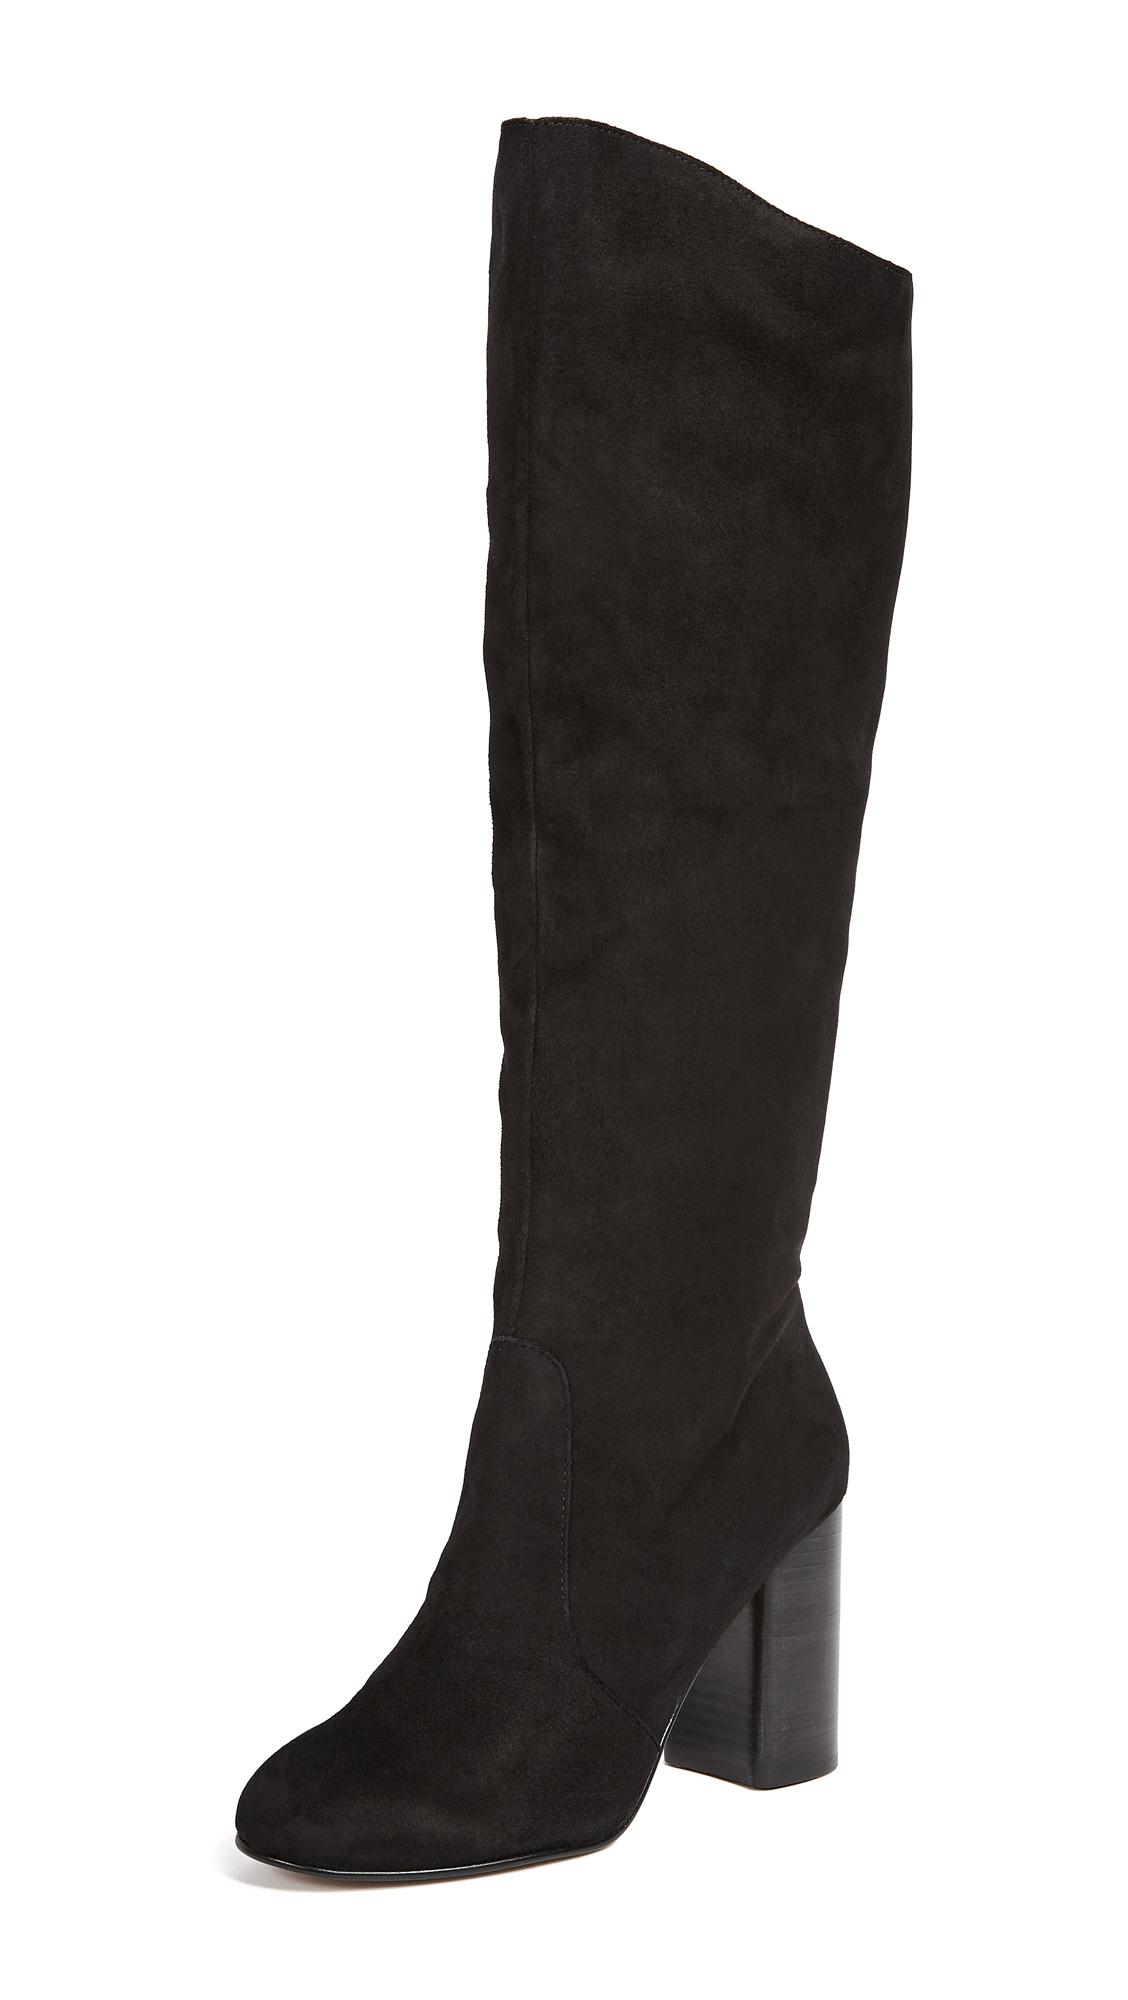 Dolce Vita Rhea Boots - Black